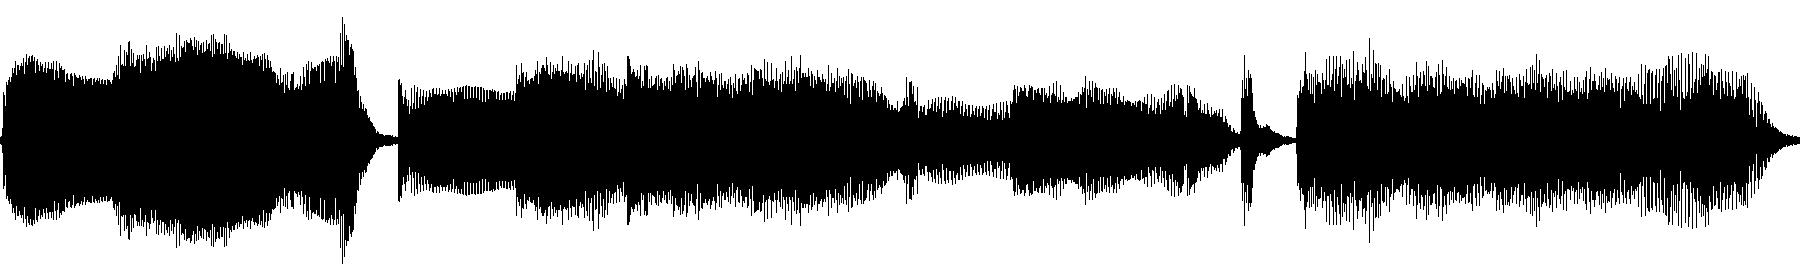 90 b ep silkyroads 02